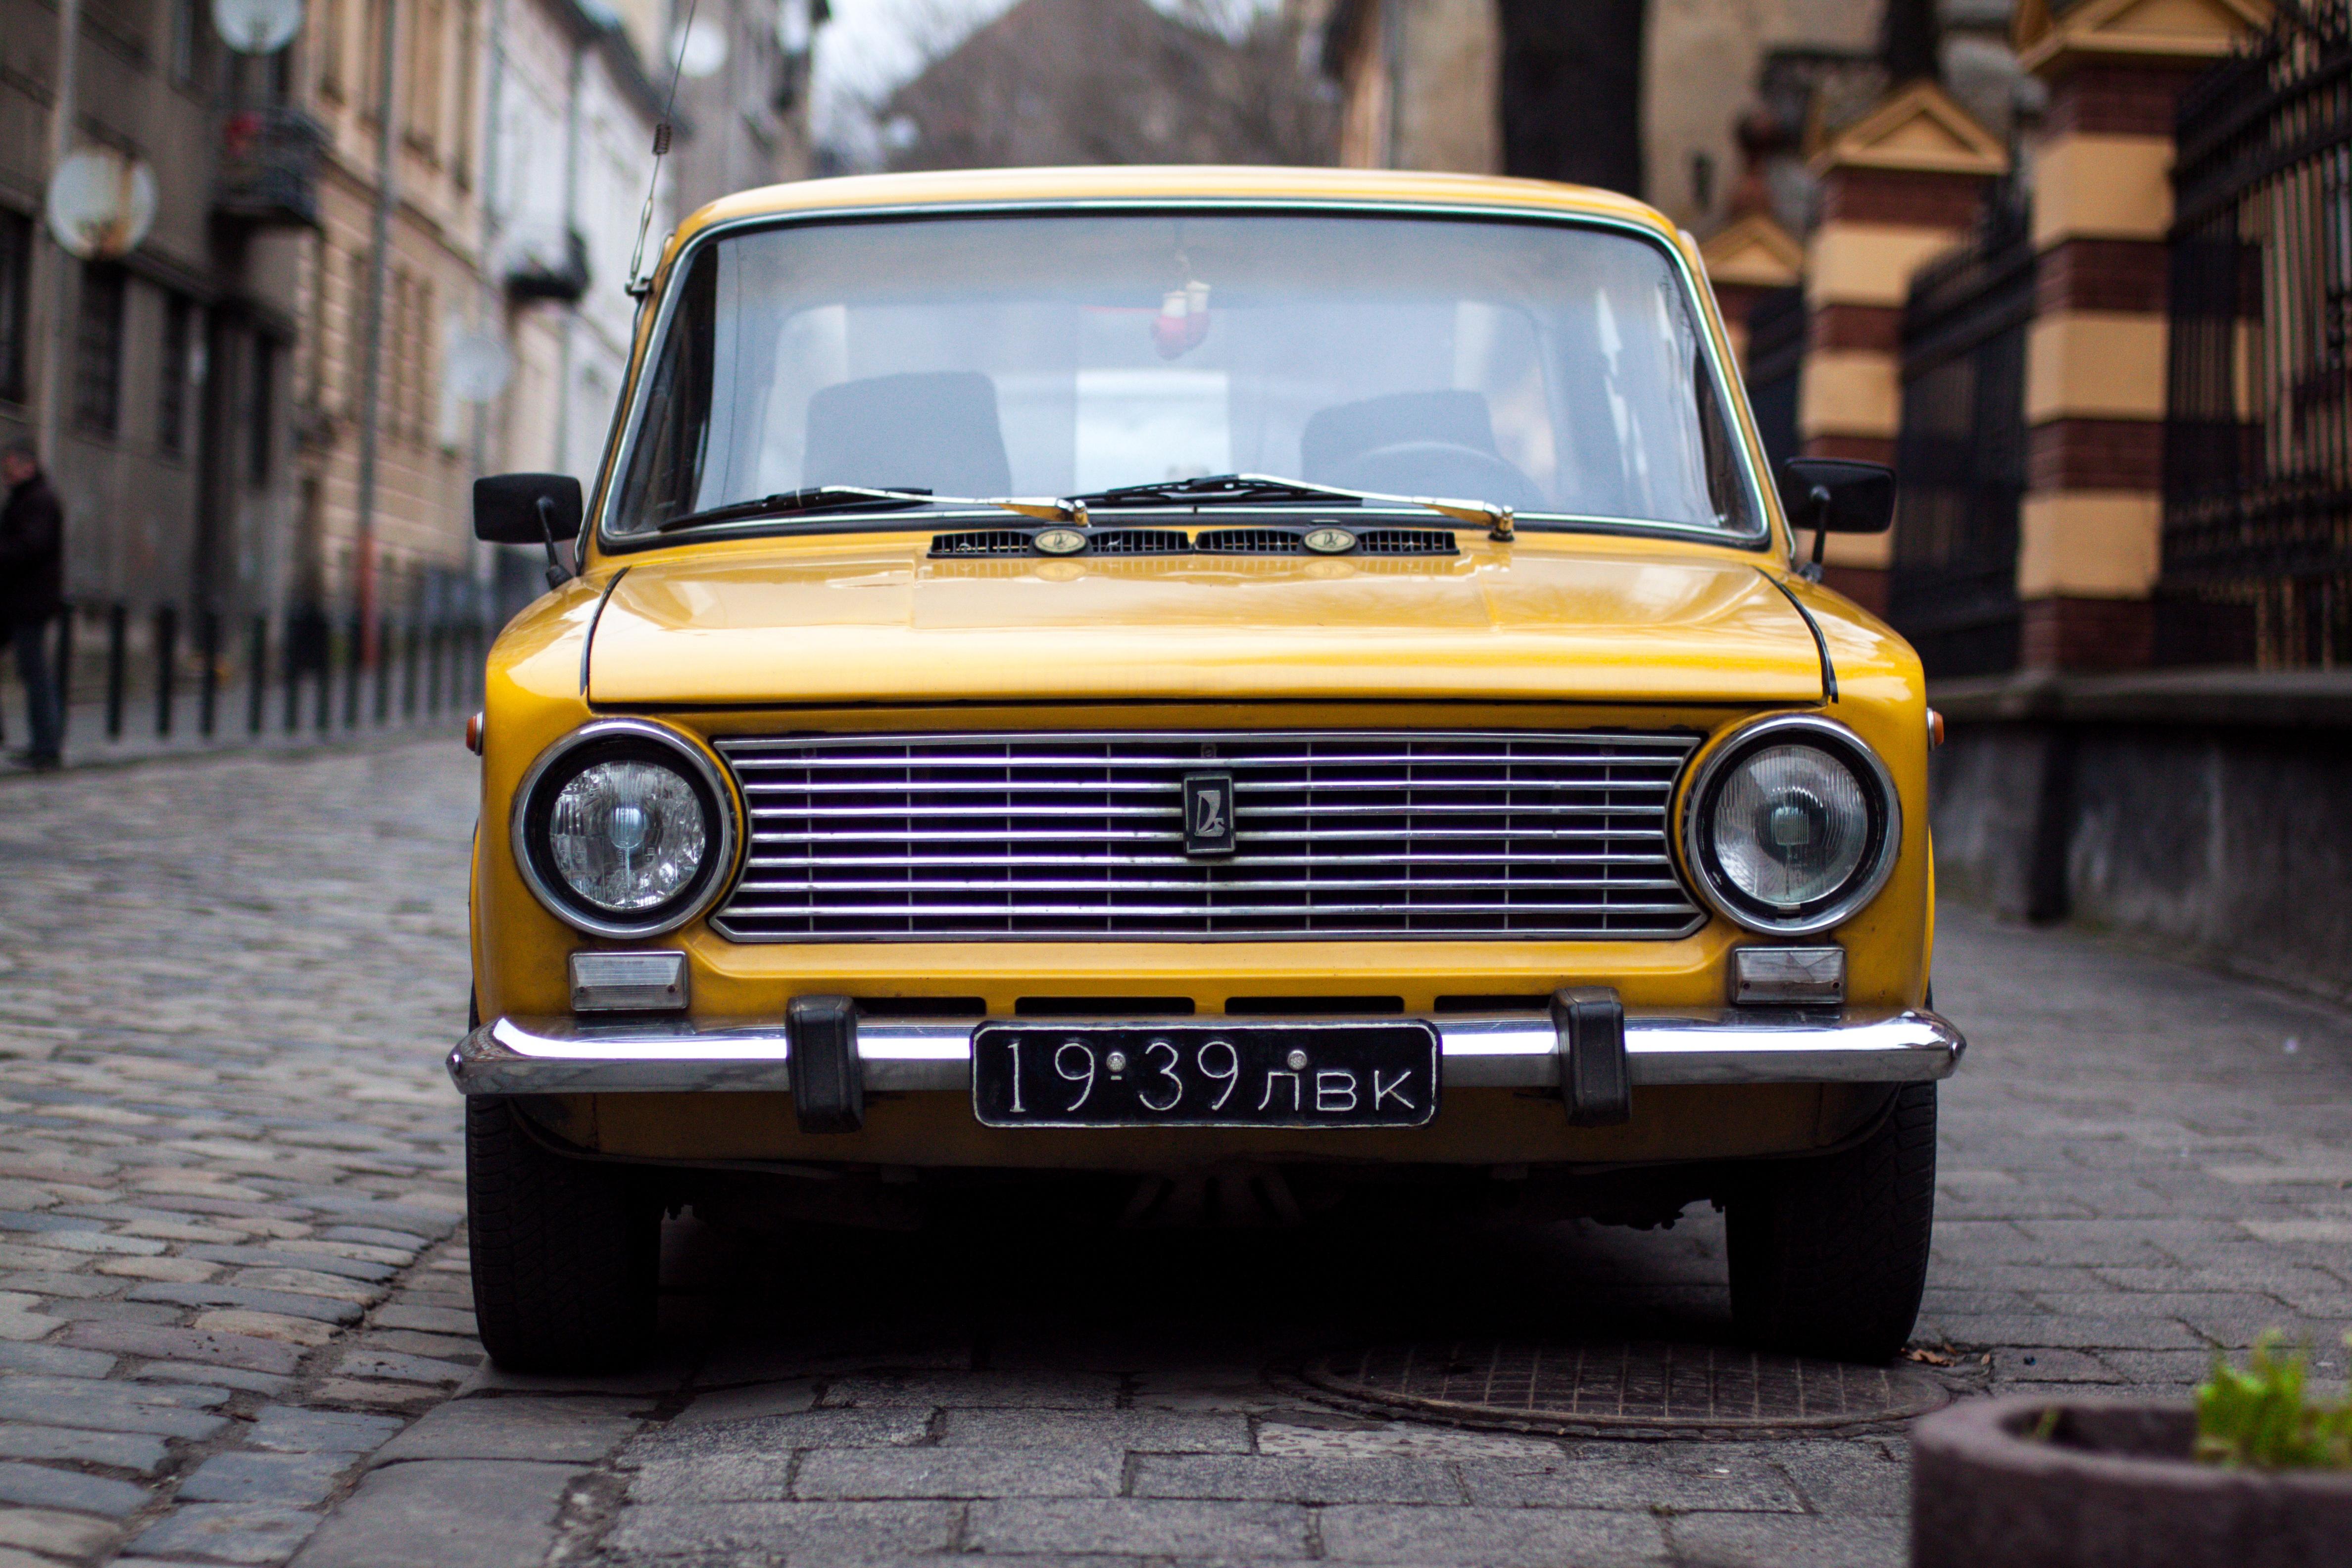 Free Images : vintage, yellow, old car, sedan, antique car, sport ...